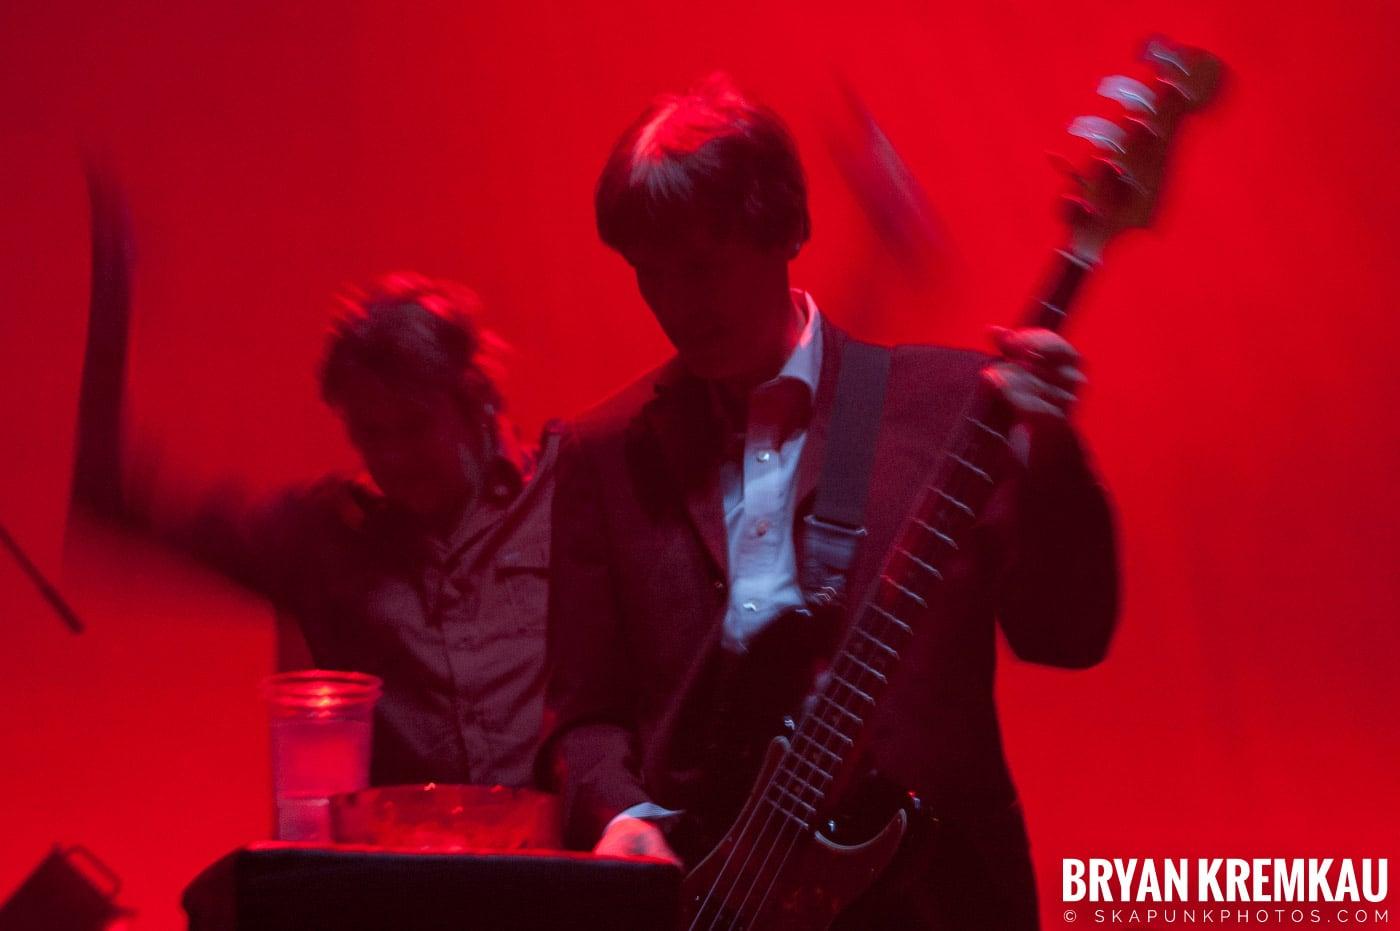 The Pogues @ Brixton Academy, London UK - 12.17.06 (1)